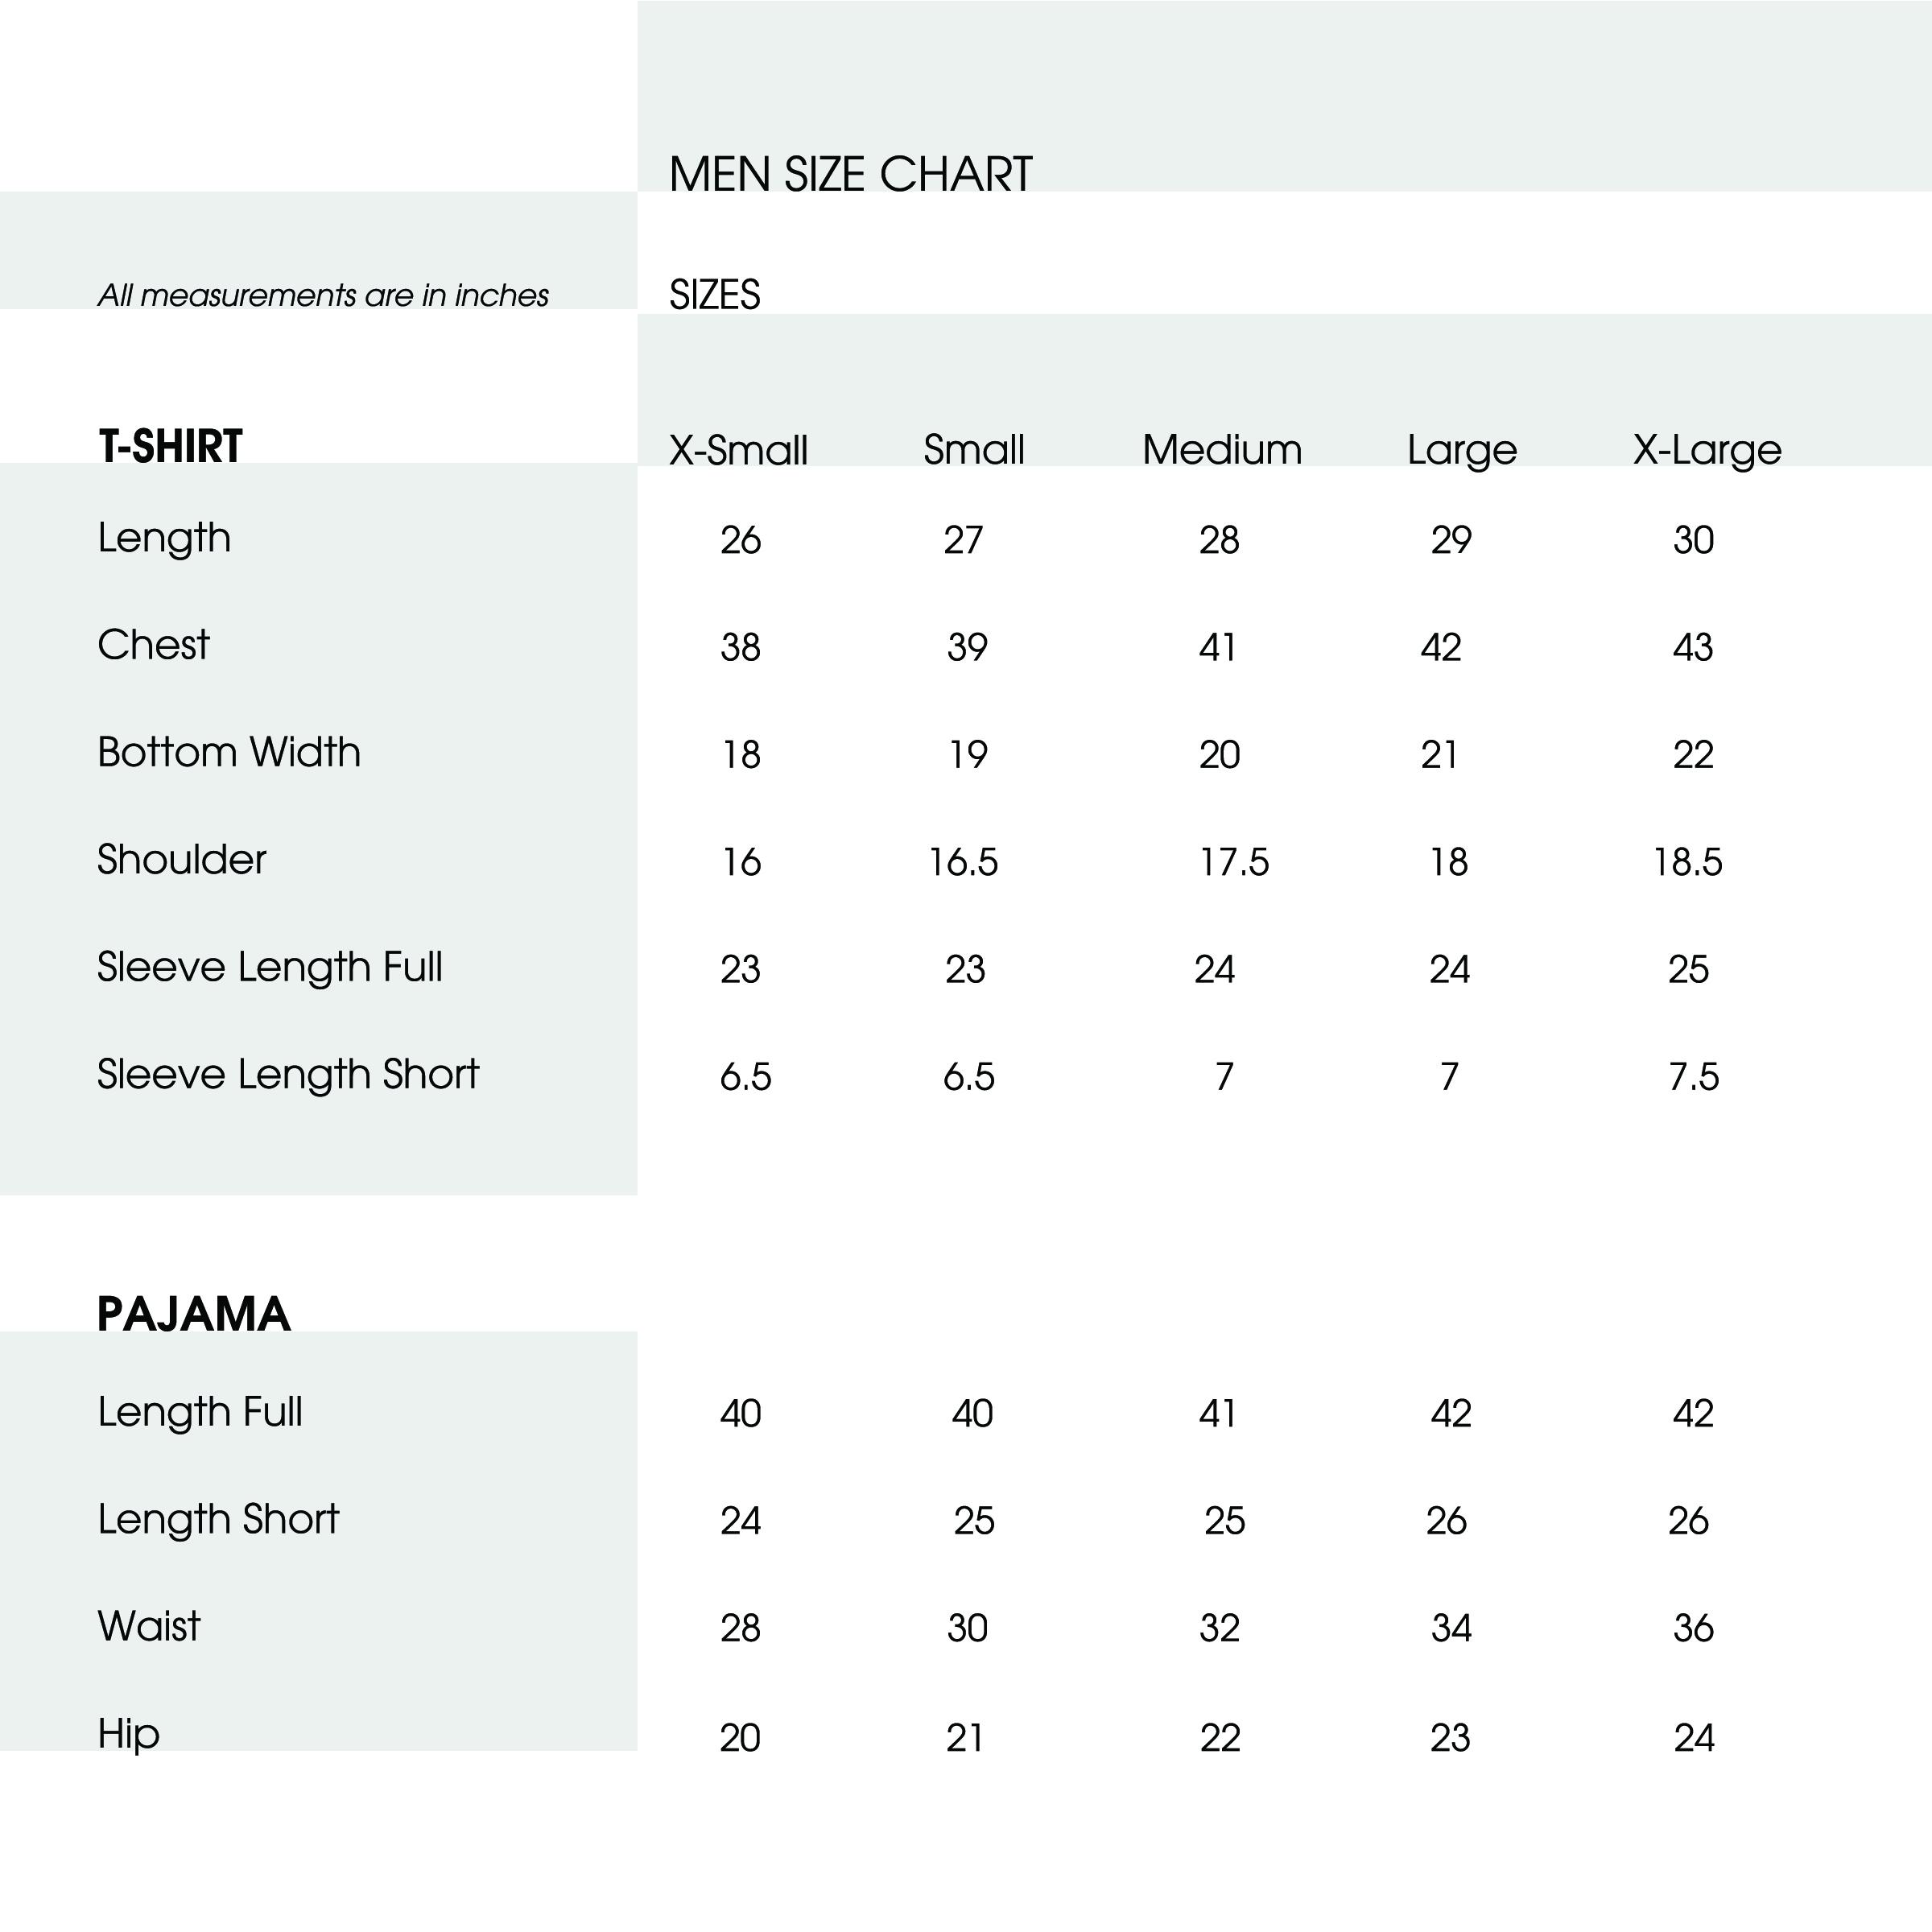 men-specs-sheet-website-jersey-fleece.jpg